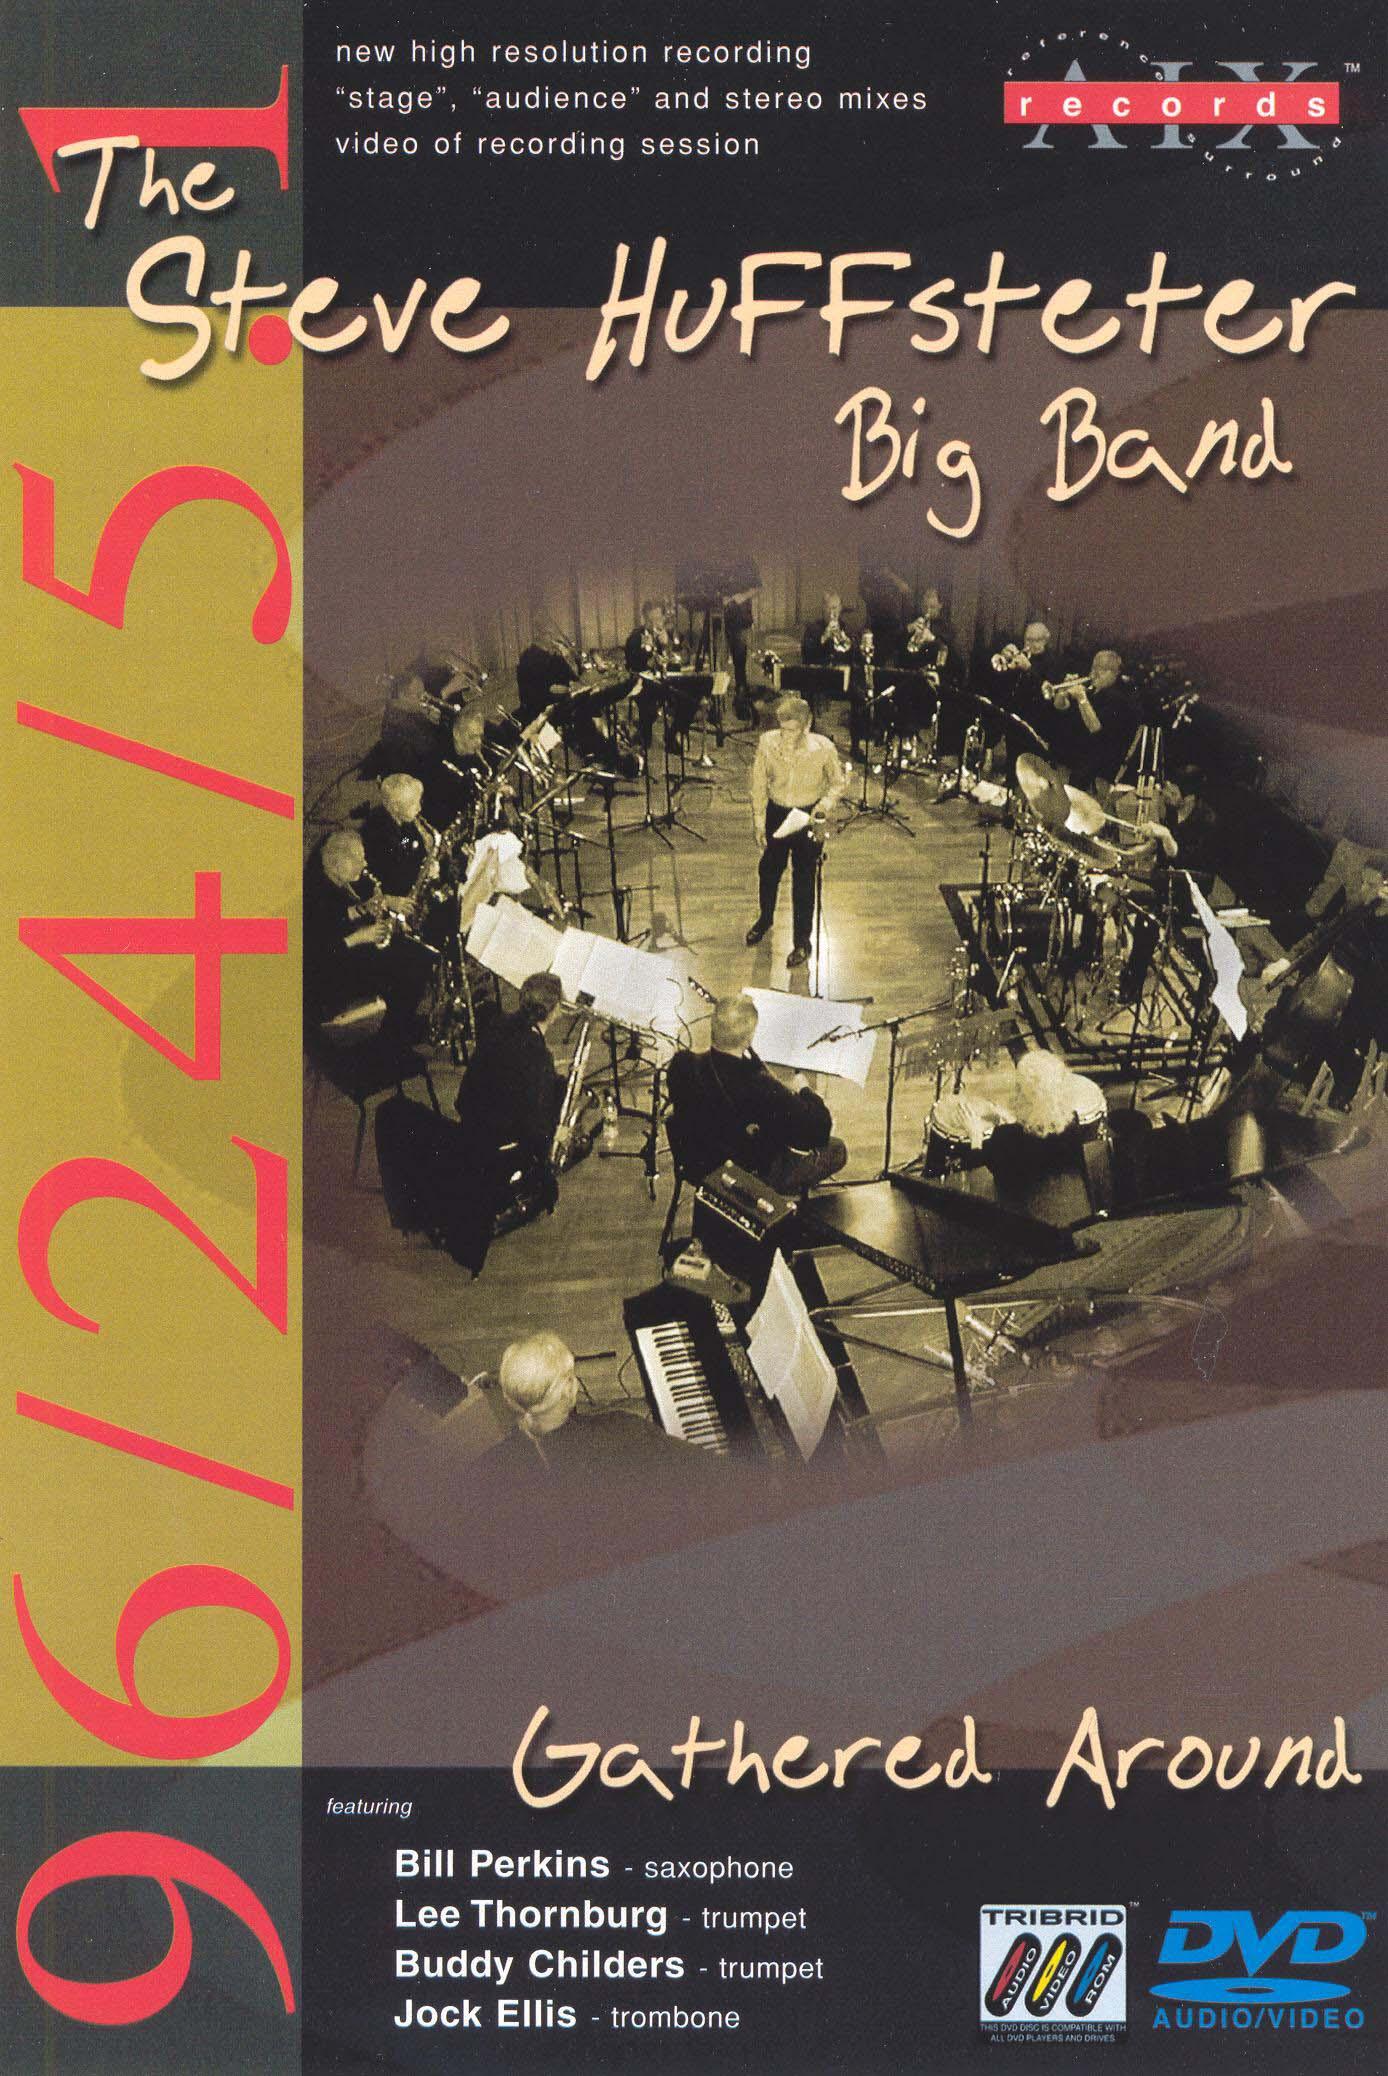 The Steve Huffsteter Big Band: Gathered Around